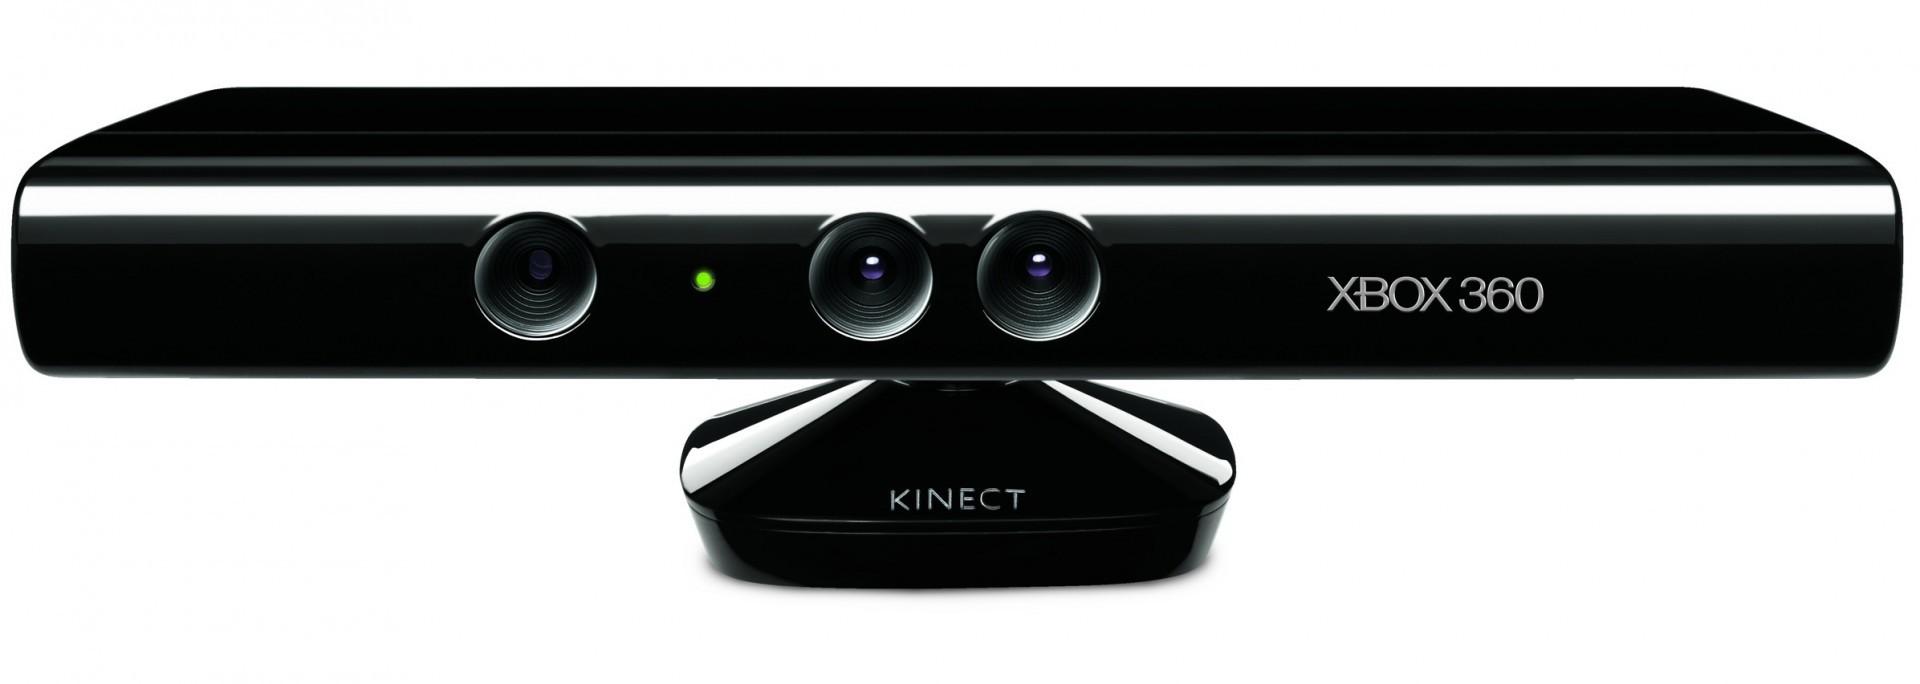 Kinect Xbox360